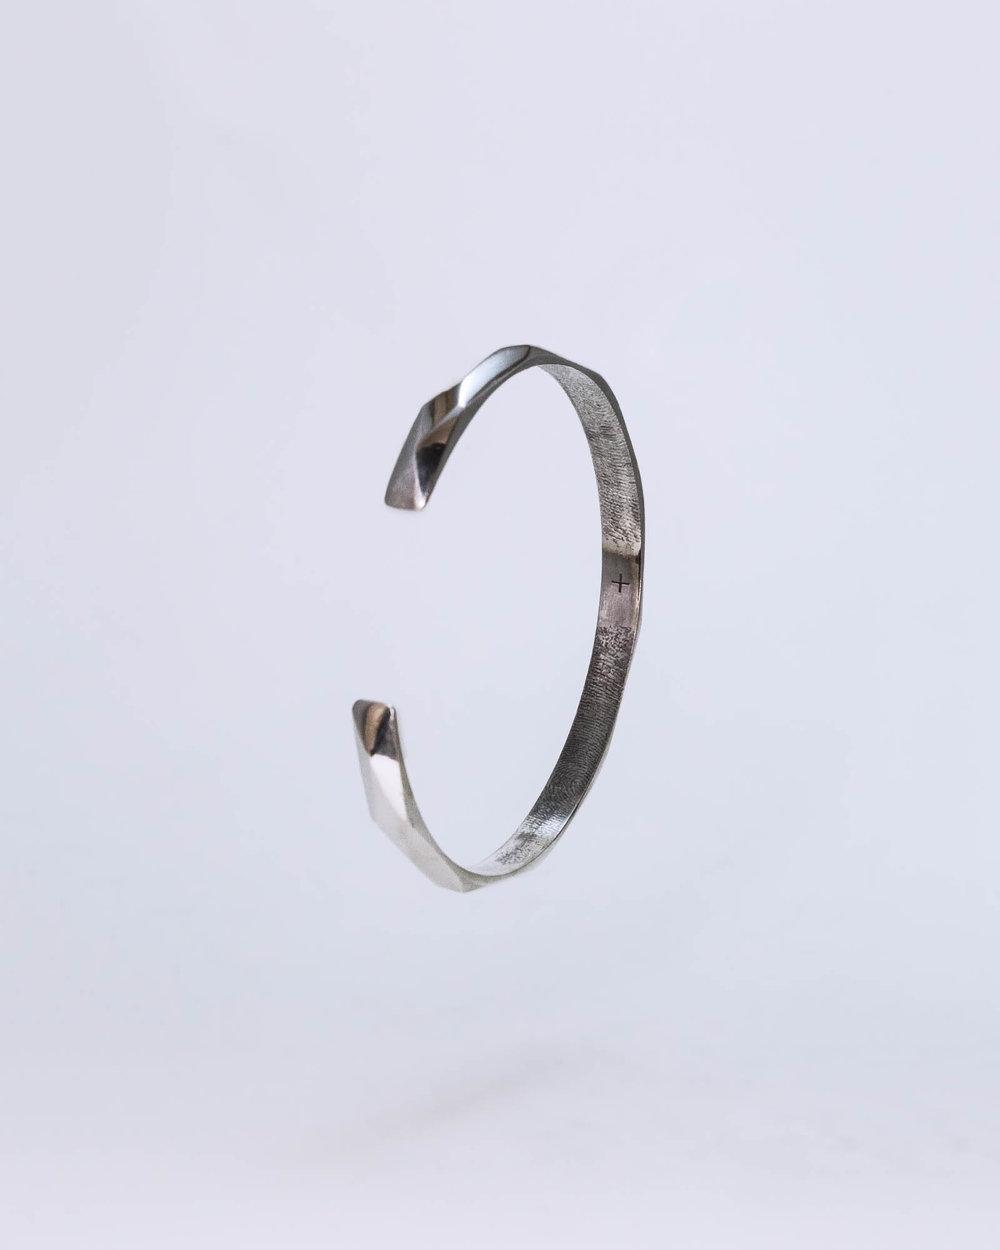 %22Facet Band Fingerprint (3)%22, Brian Kivuti (February 22, 2018) [web.v.2.Cropped].jpg